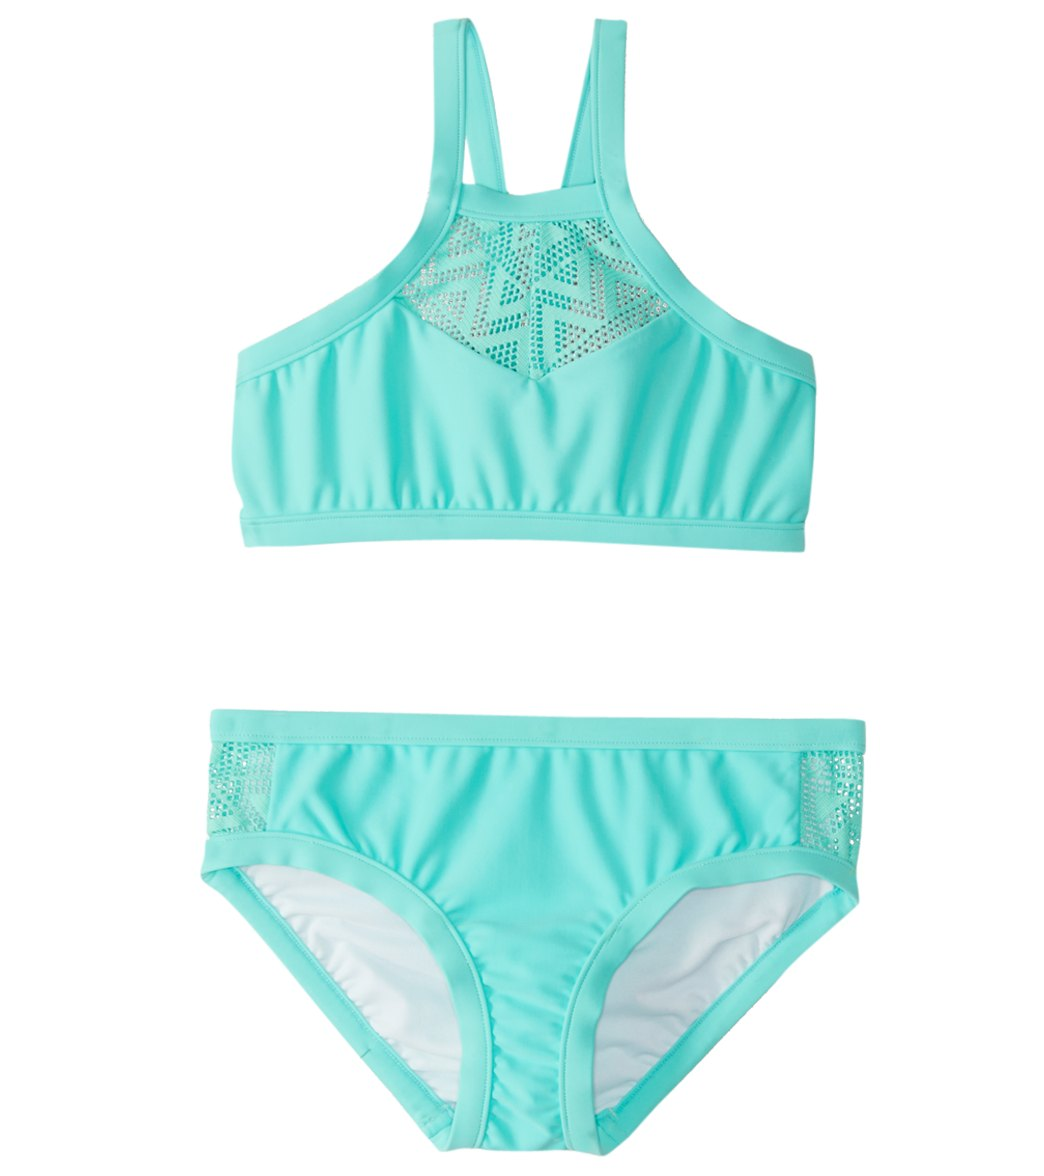 2460dd11c3add Seafolly Girls' Summer Essentials Tankini Set (6-16) at SwimOutlet.com -  Free Shipping